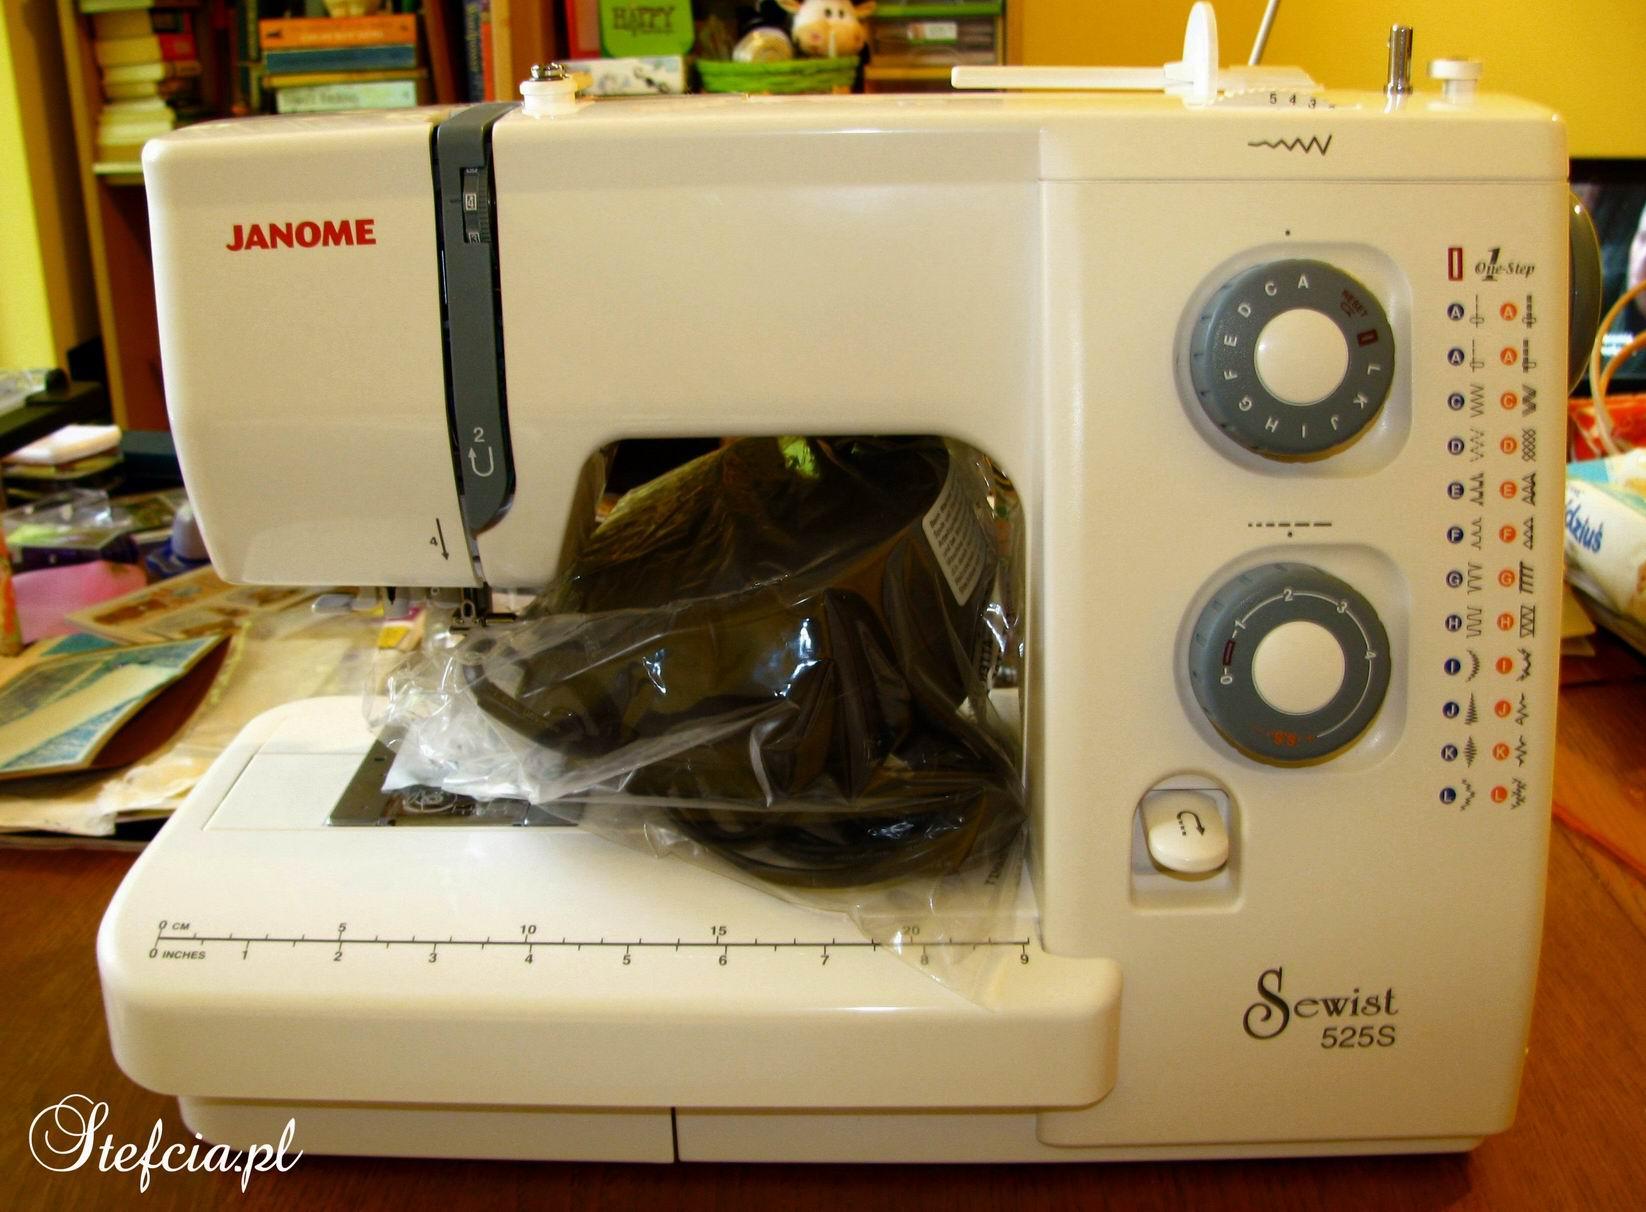 Resize of maszyna janome 525s